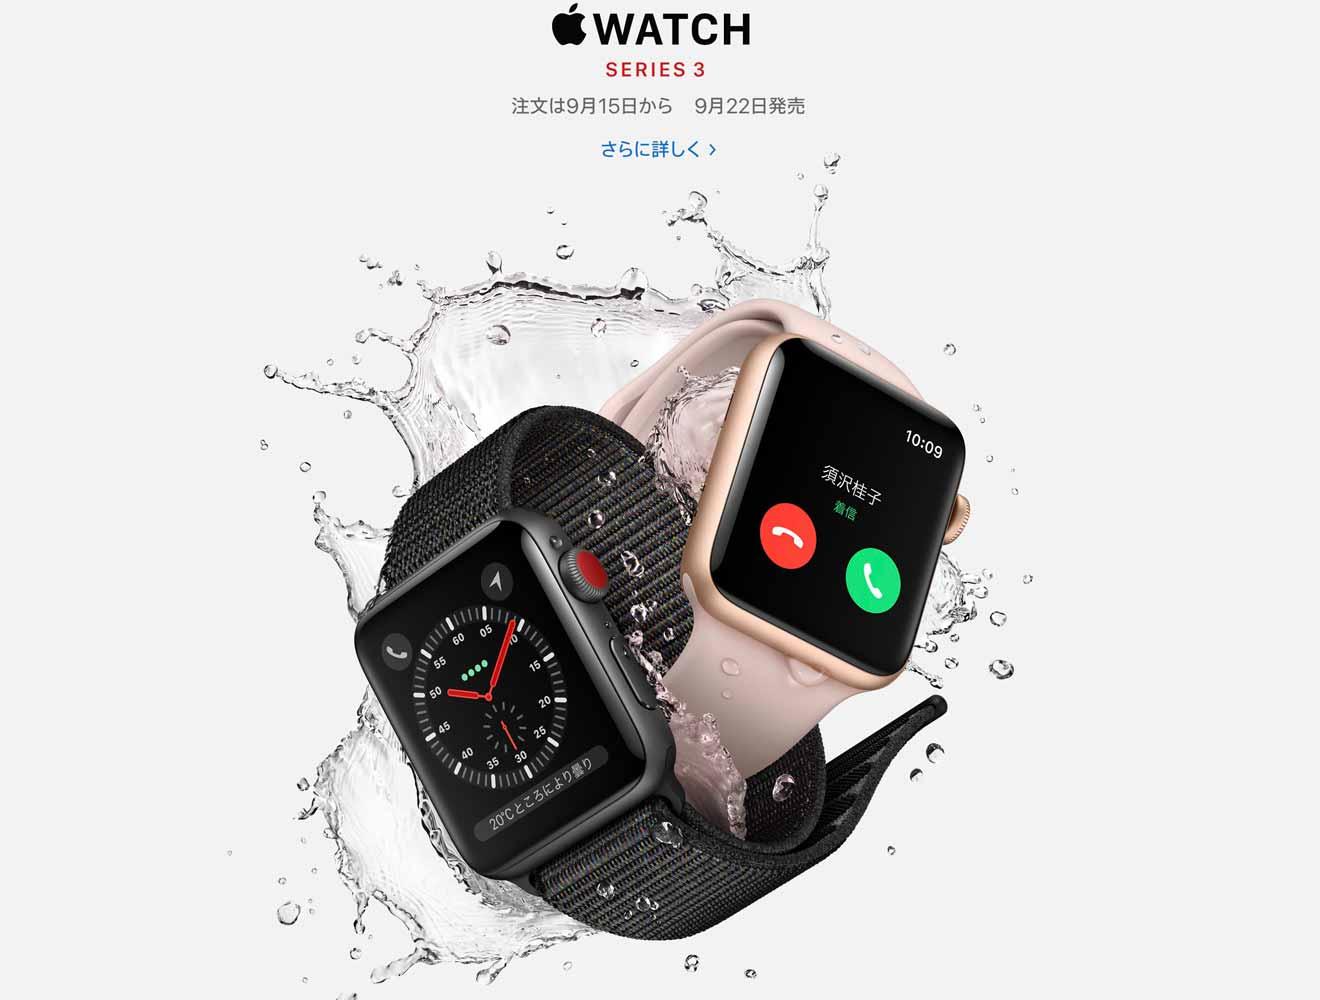 Apple、「Apple Watch Series 3」の公式日本語サイトを公開 ― 注文は9月15日から